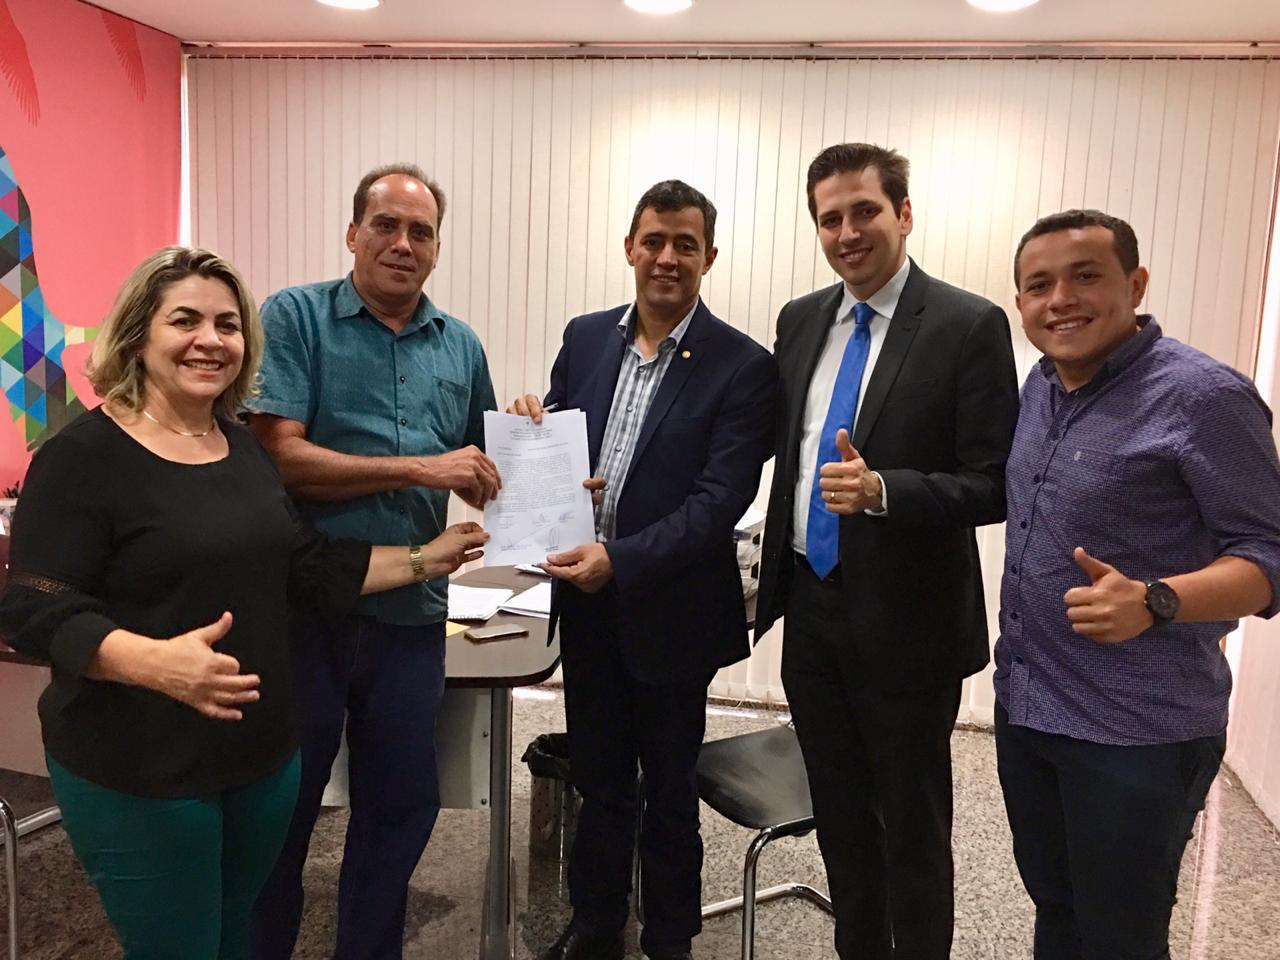 Olyntho garante mais uma ambulância para Guaraí